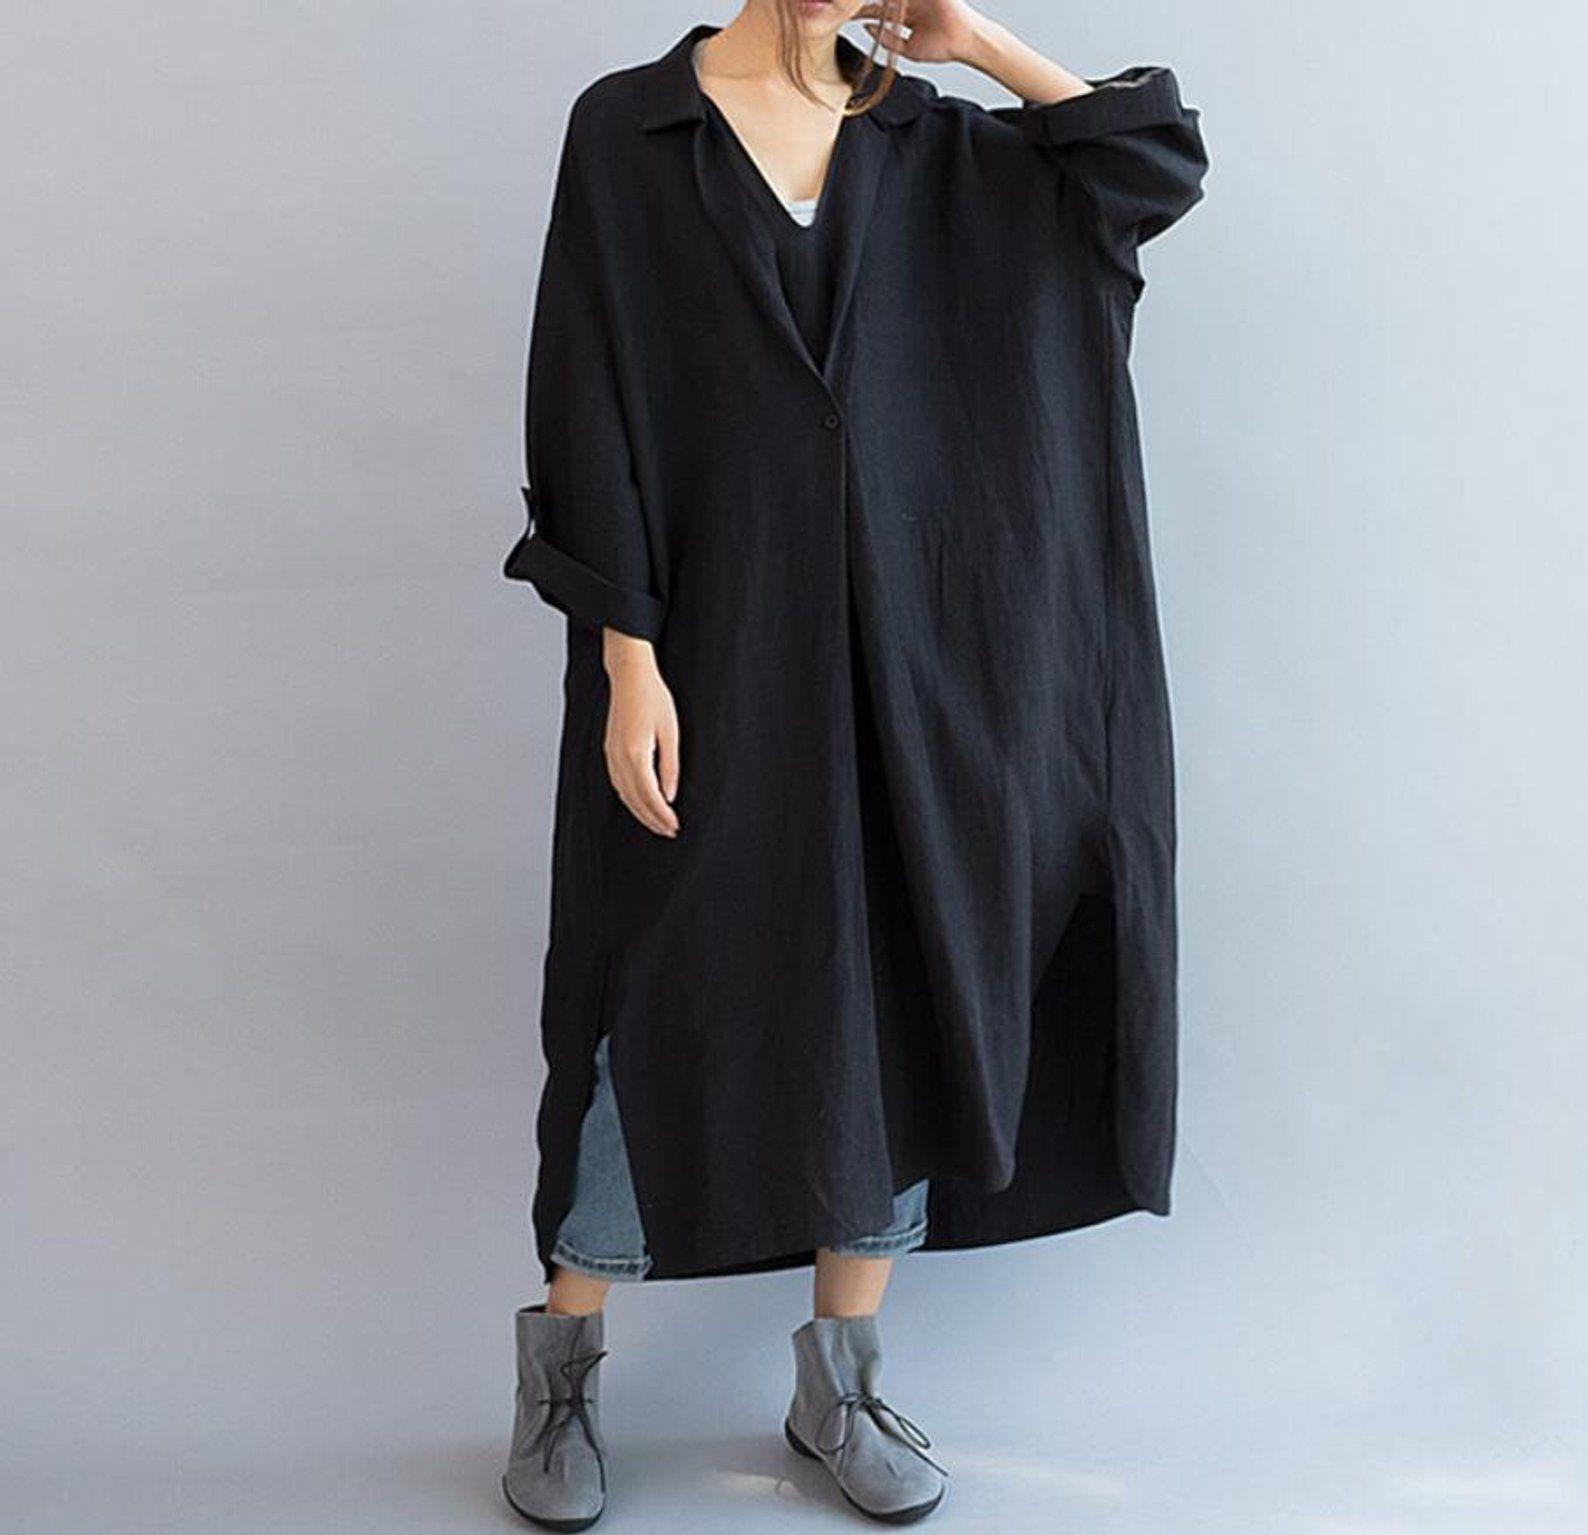 Womens Dresses Linen Cotton Dress Loose Fitting Maxi Dress Etsy Fashion Long Linen Dress Linen Casual [ 1535 x 1588 Pixel ]